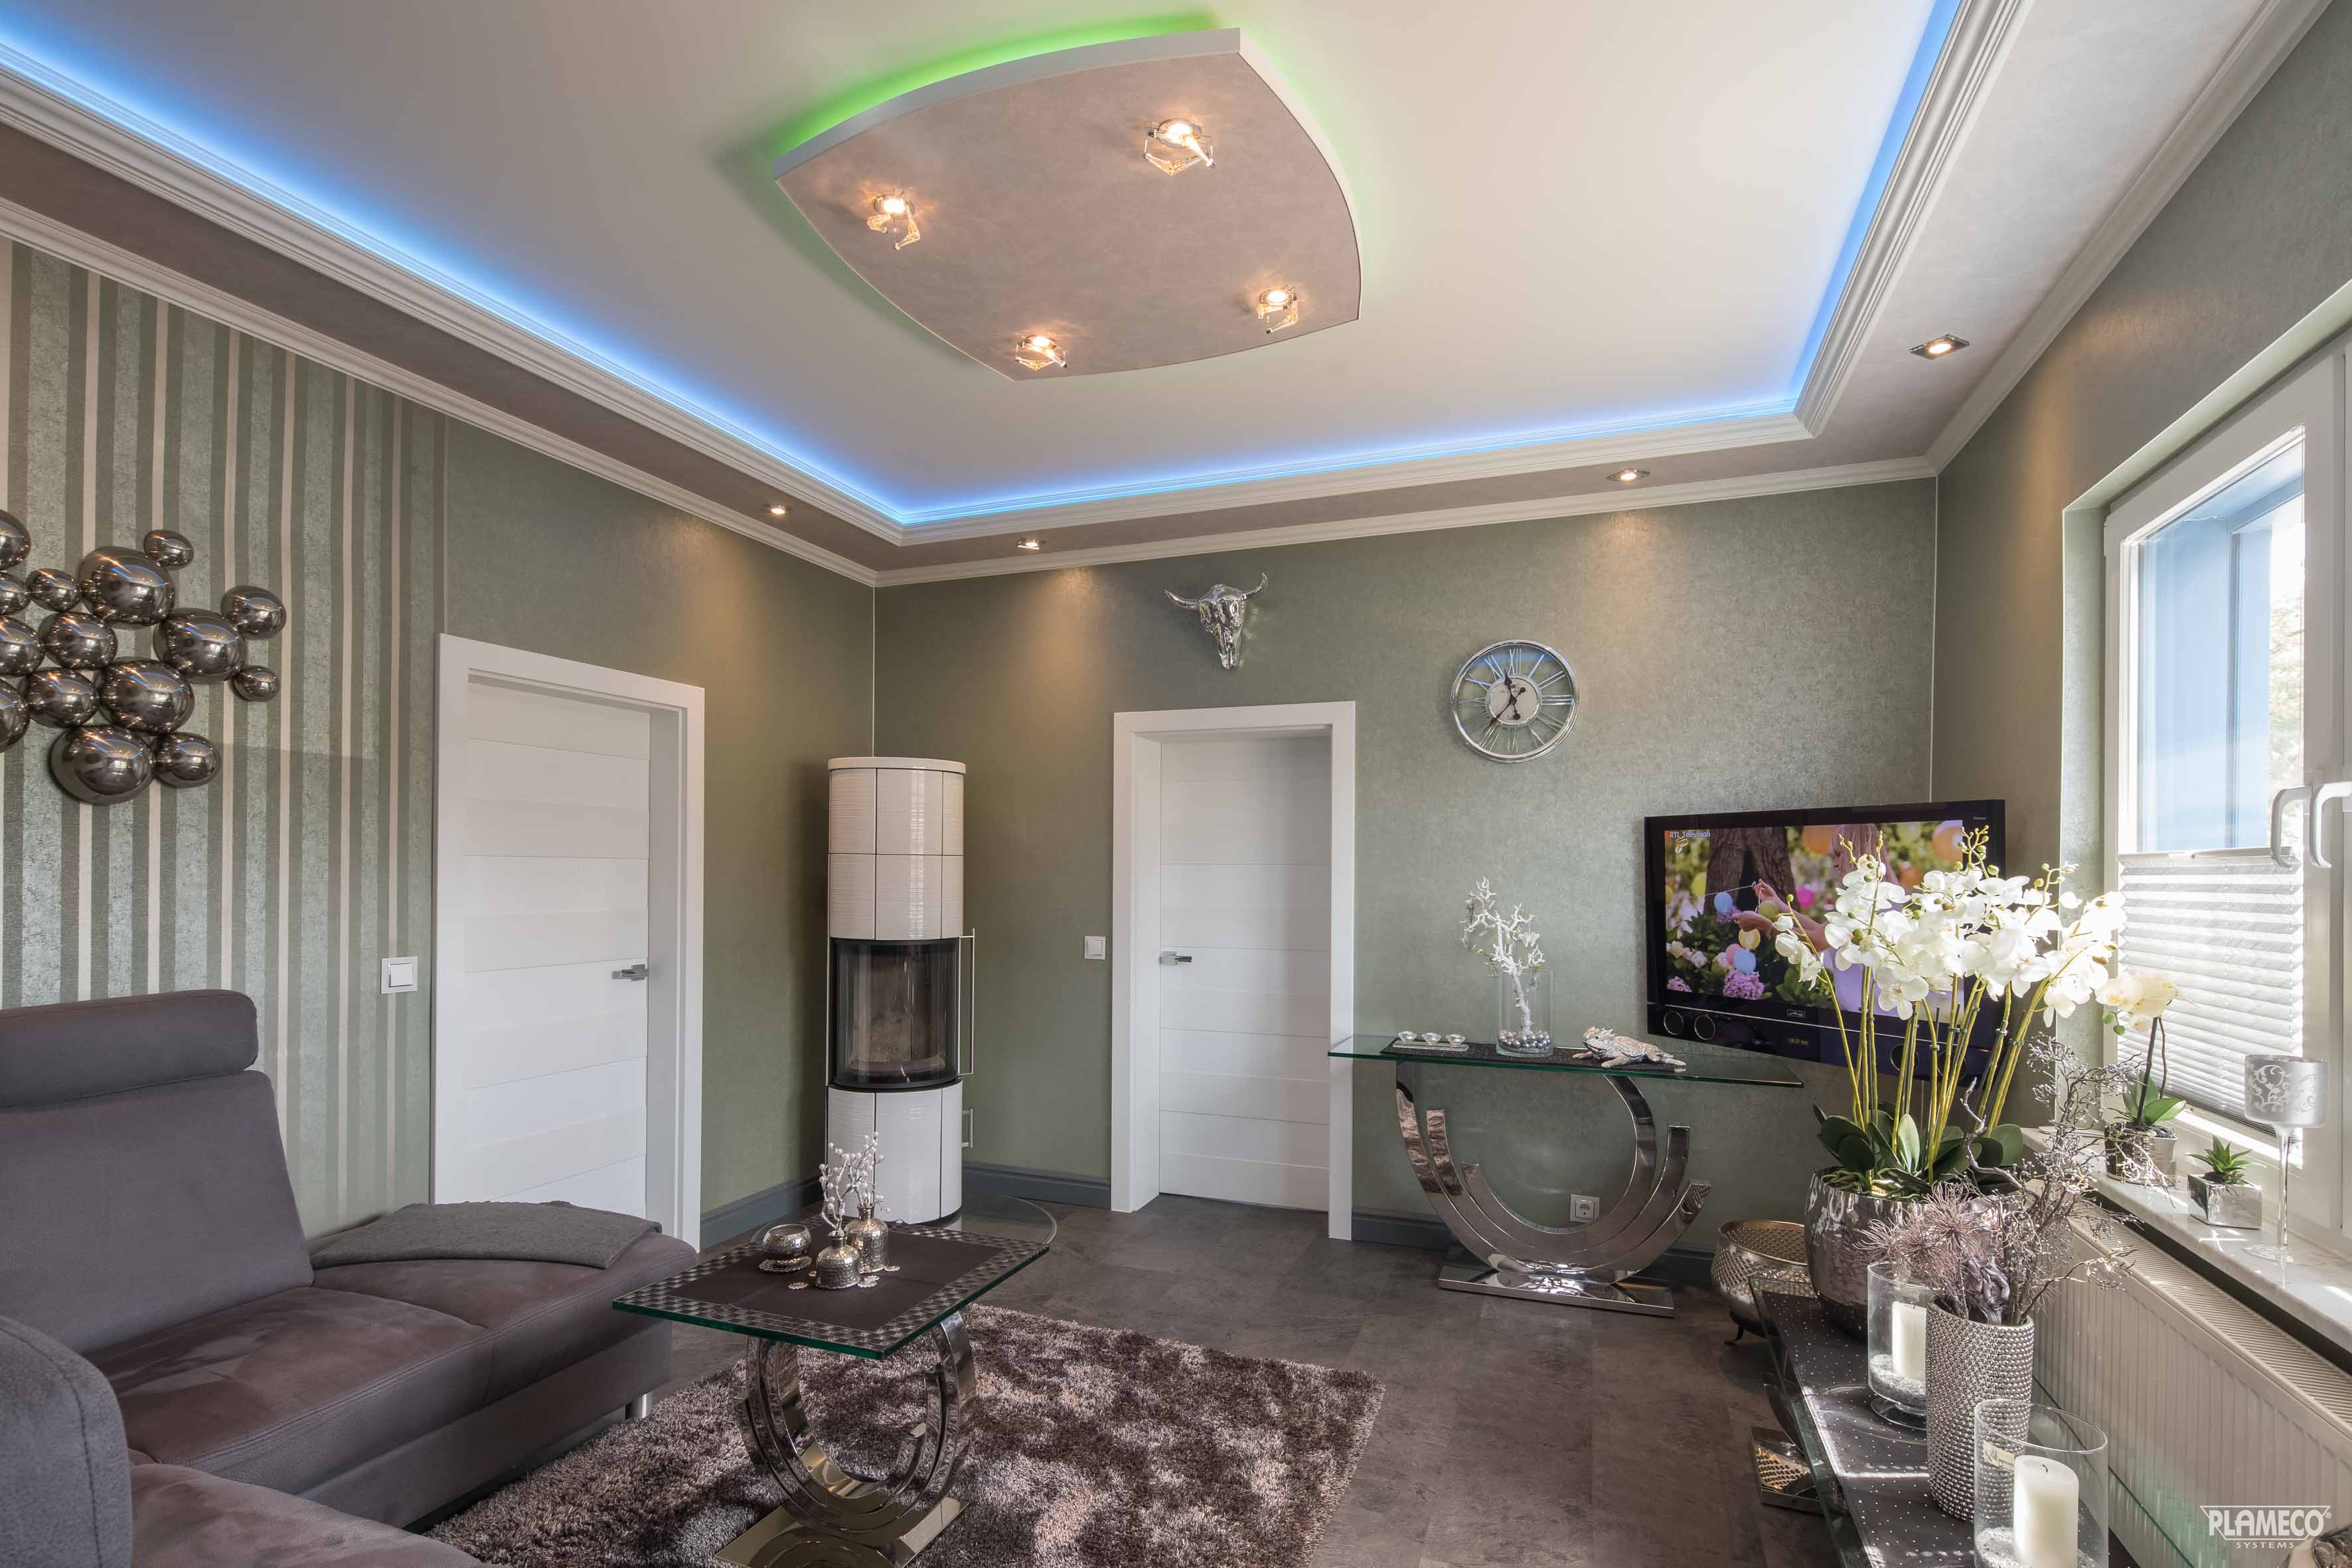 spanndecken material kaufen plameco beckmann. Black Bedroom Furniture Sets. Home Design Ideas